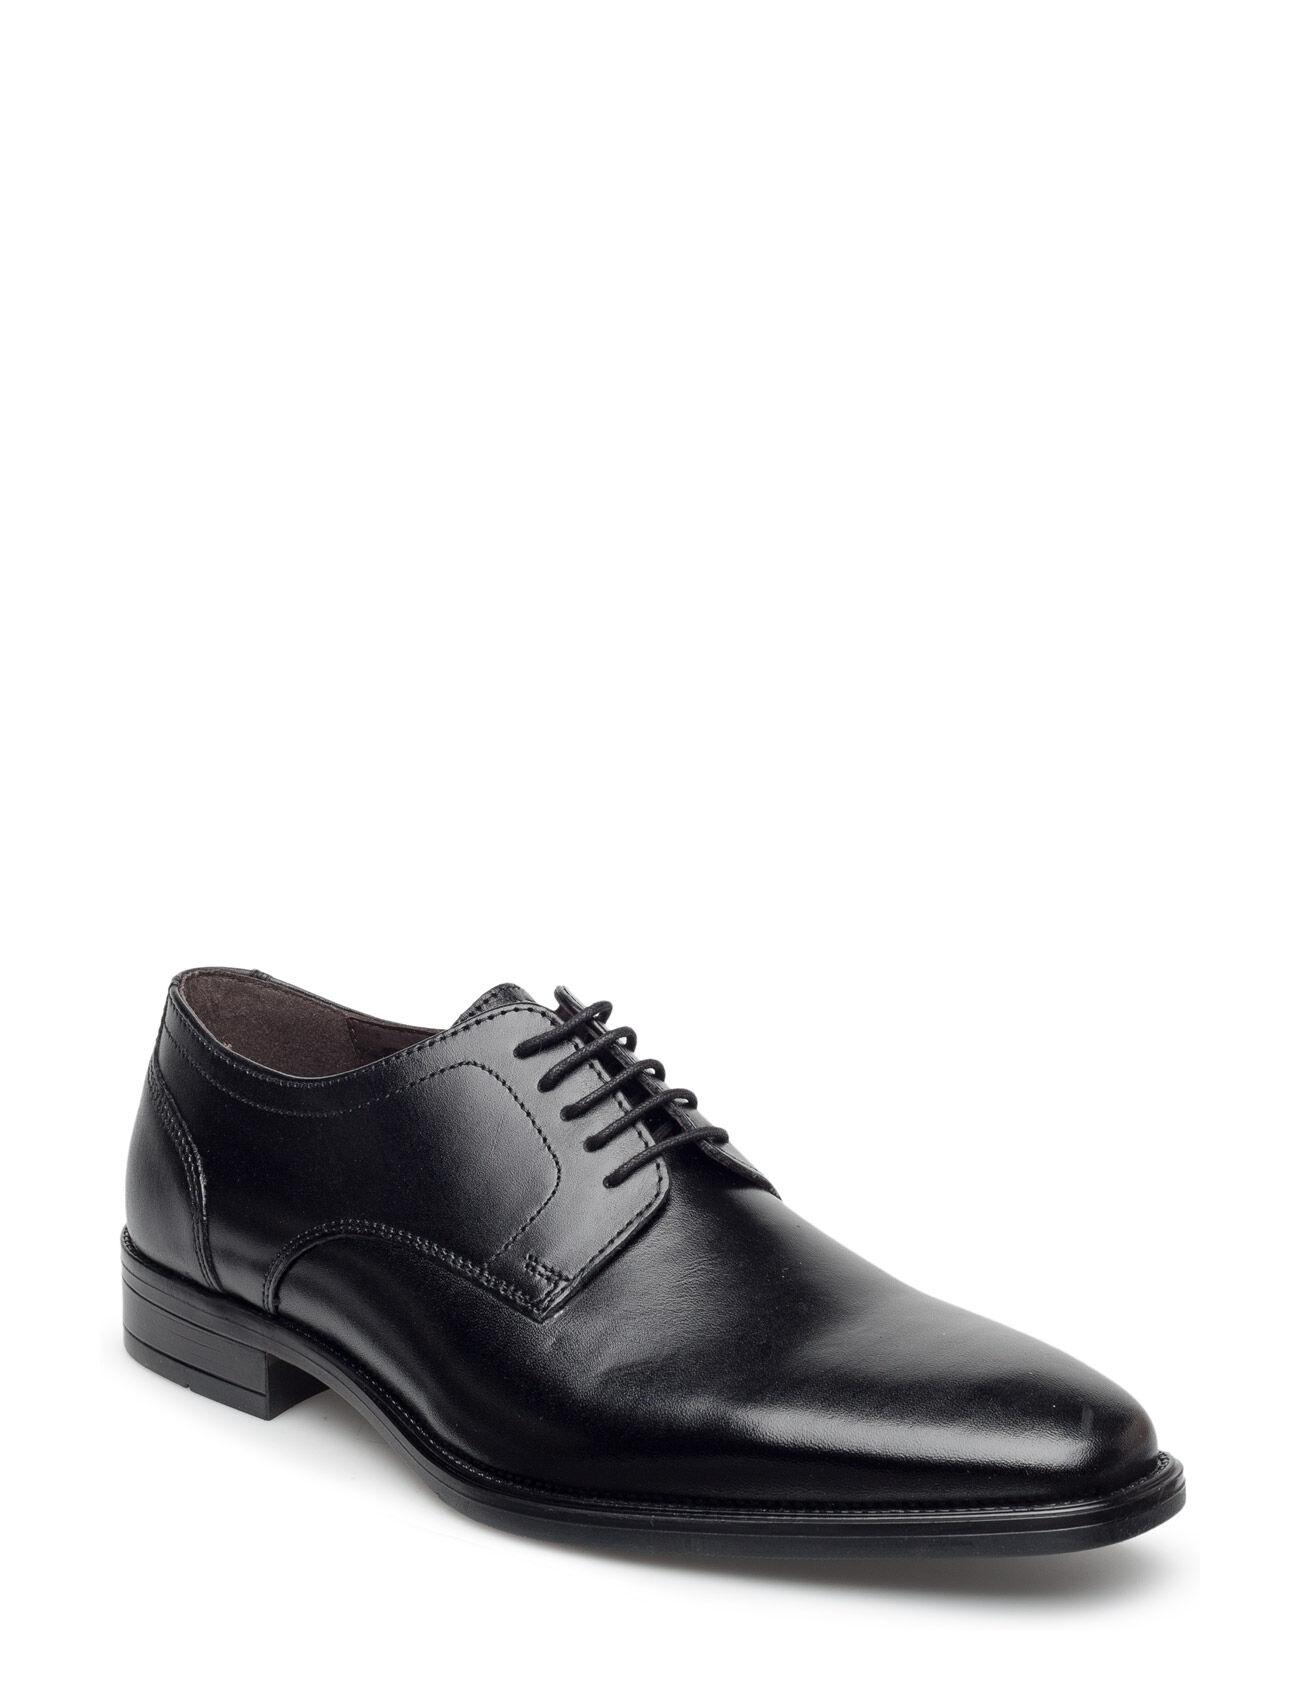 Playboy Footwear 6508